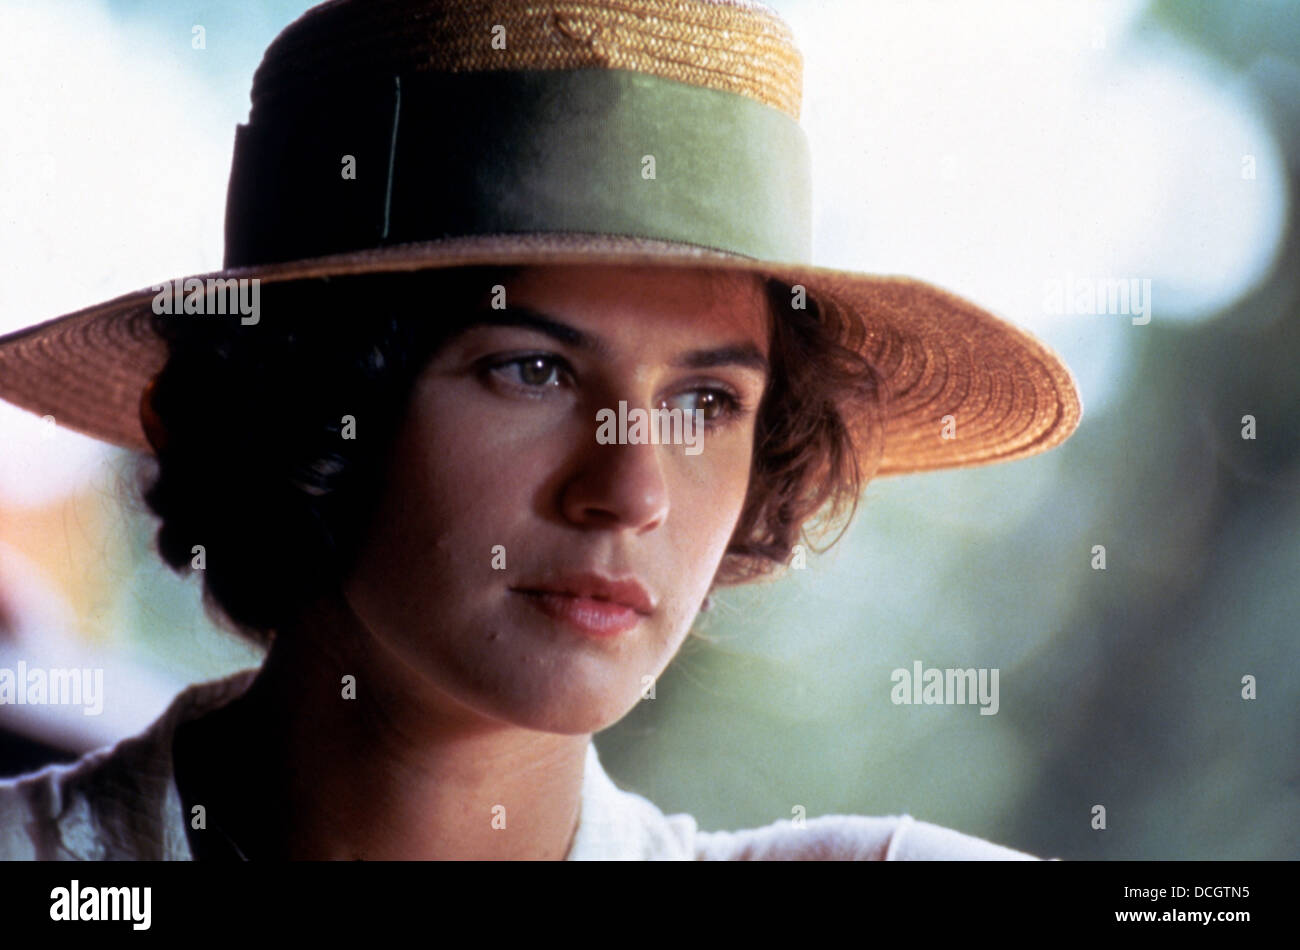 Victoria (1996) fuga para o amor (alt), Irene Jacobs; Mark peploe (dir); mujer vtry 008 colección moviestore Imagen De Stock